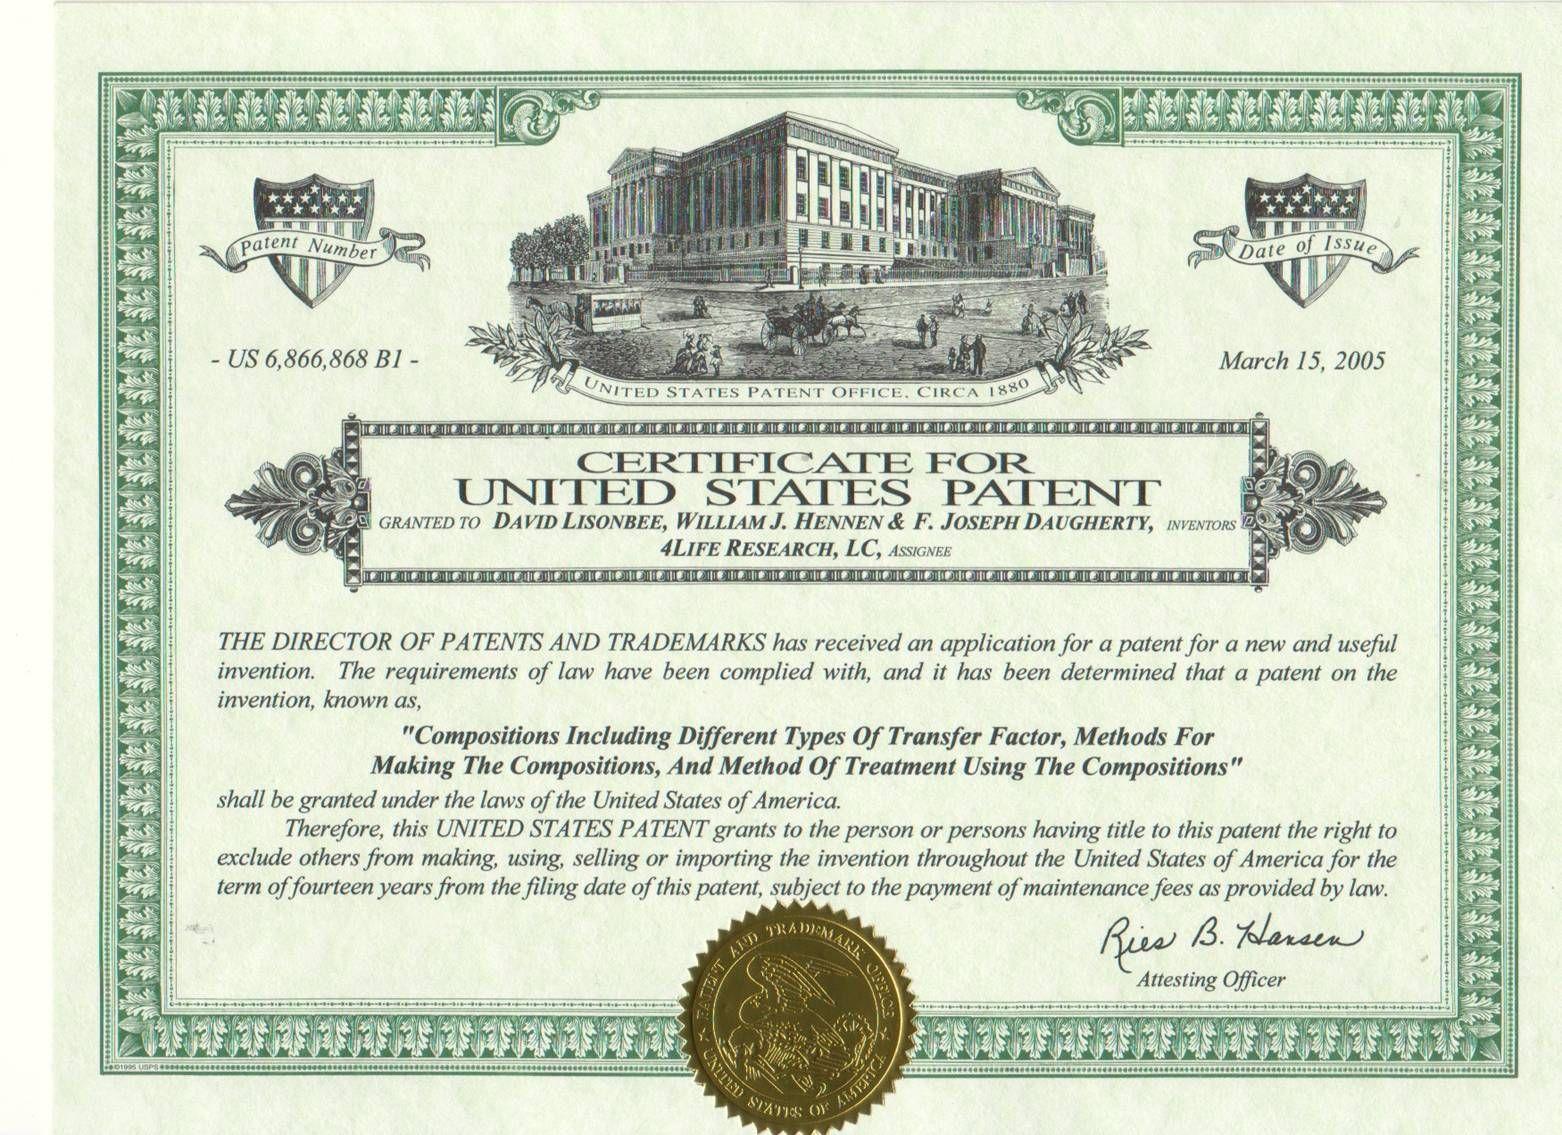 Winners Life Senarai Harga Produk Life Sijil Pengesahan Halal - Patent certificate template